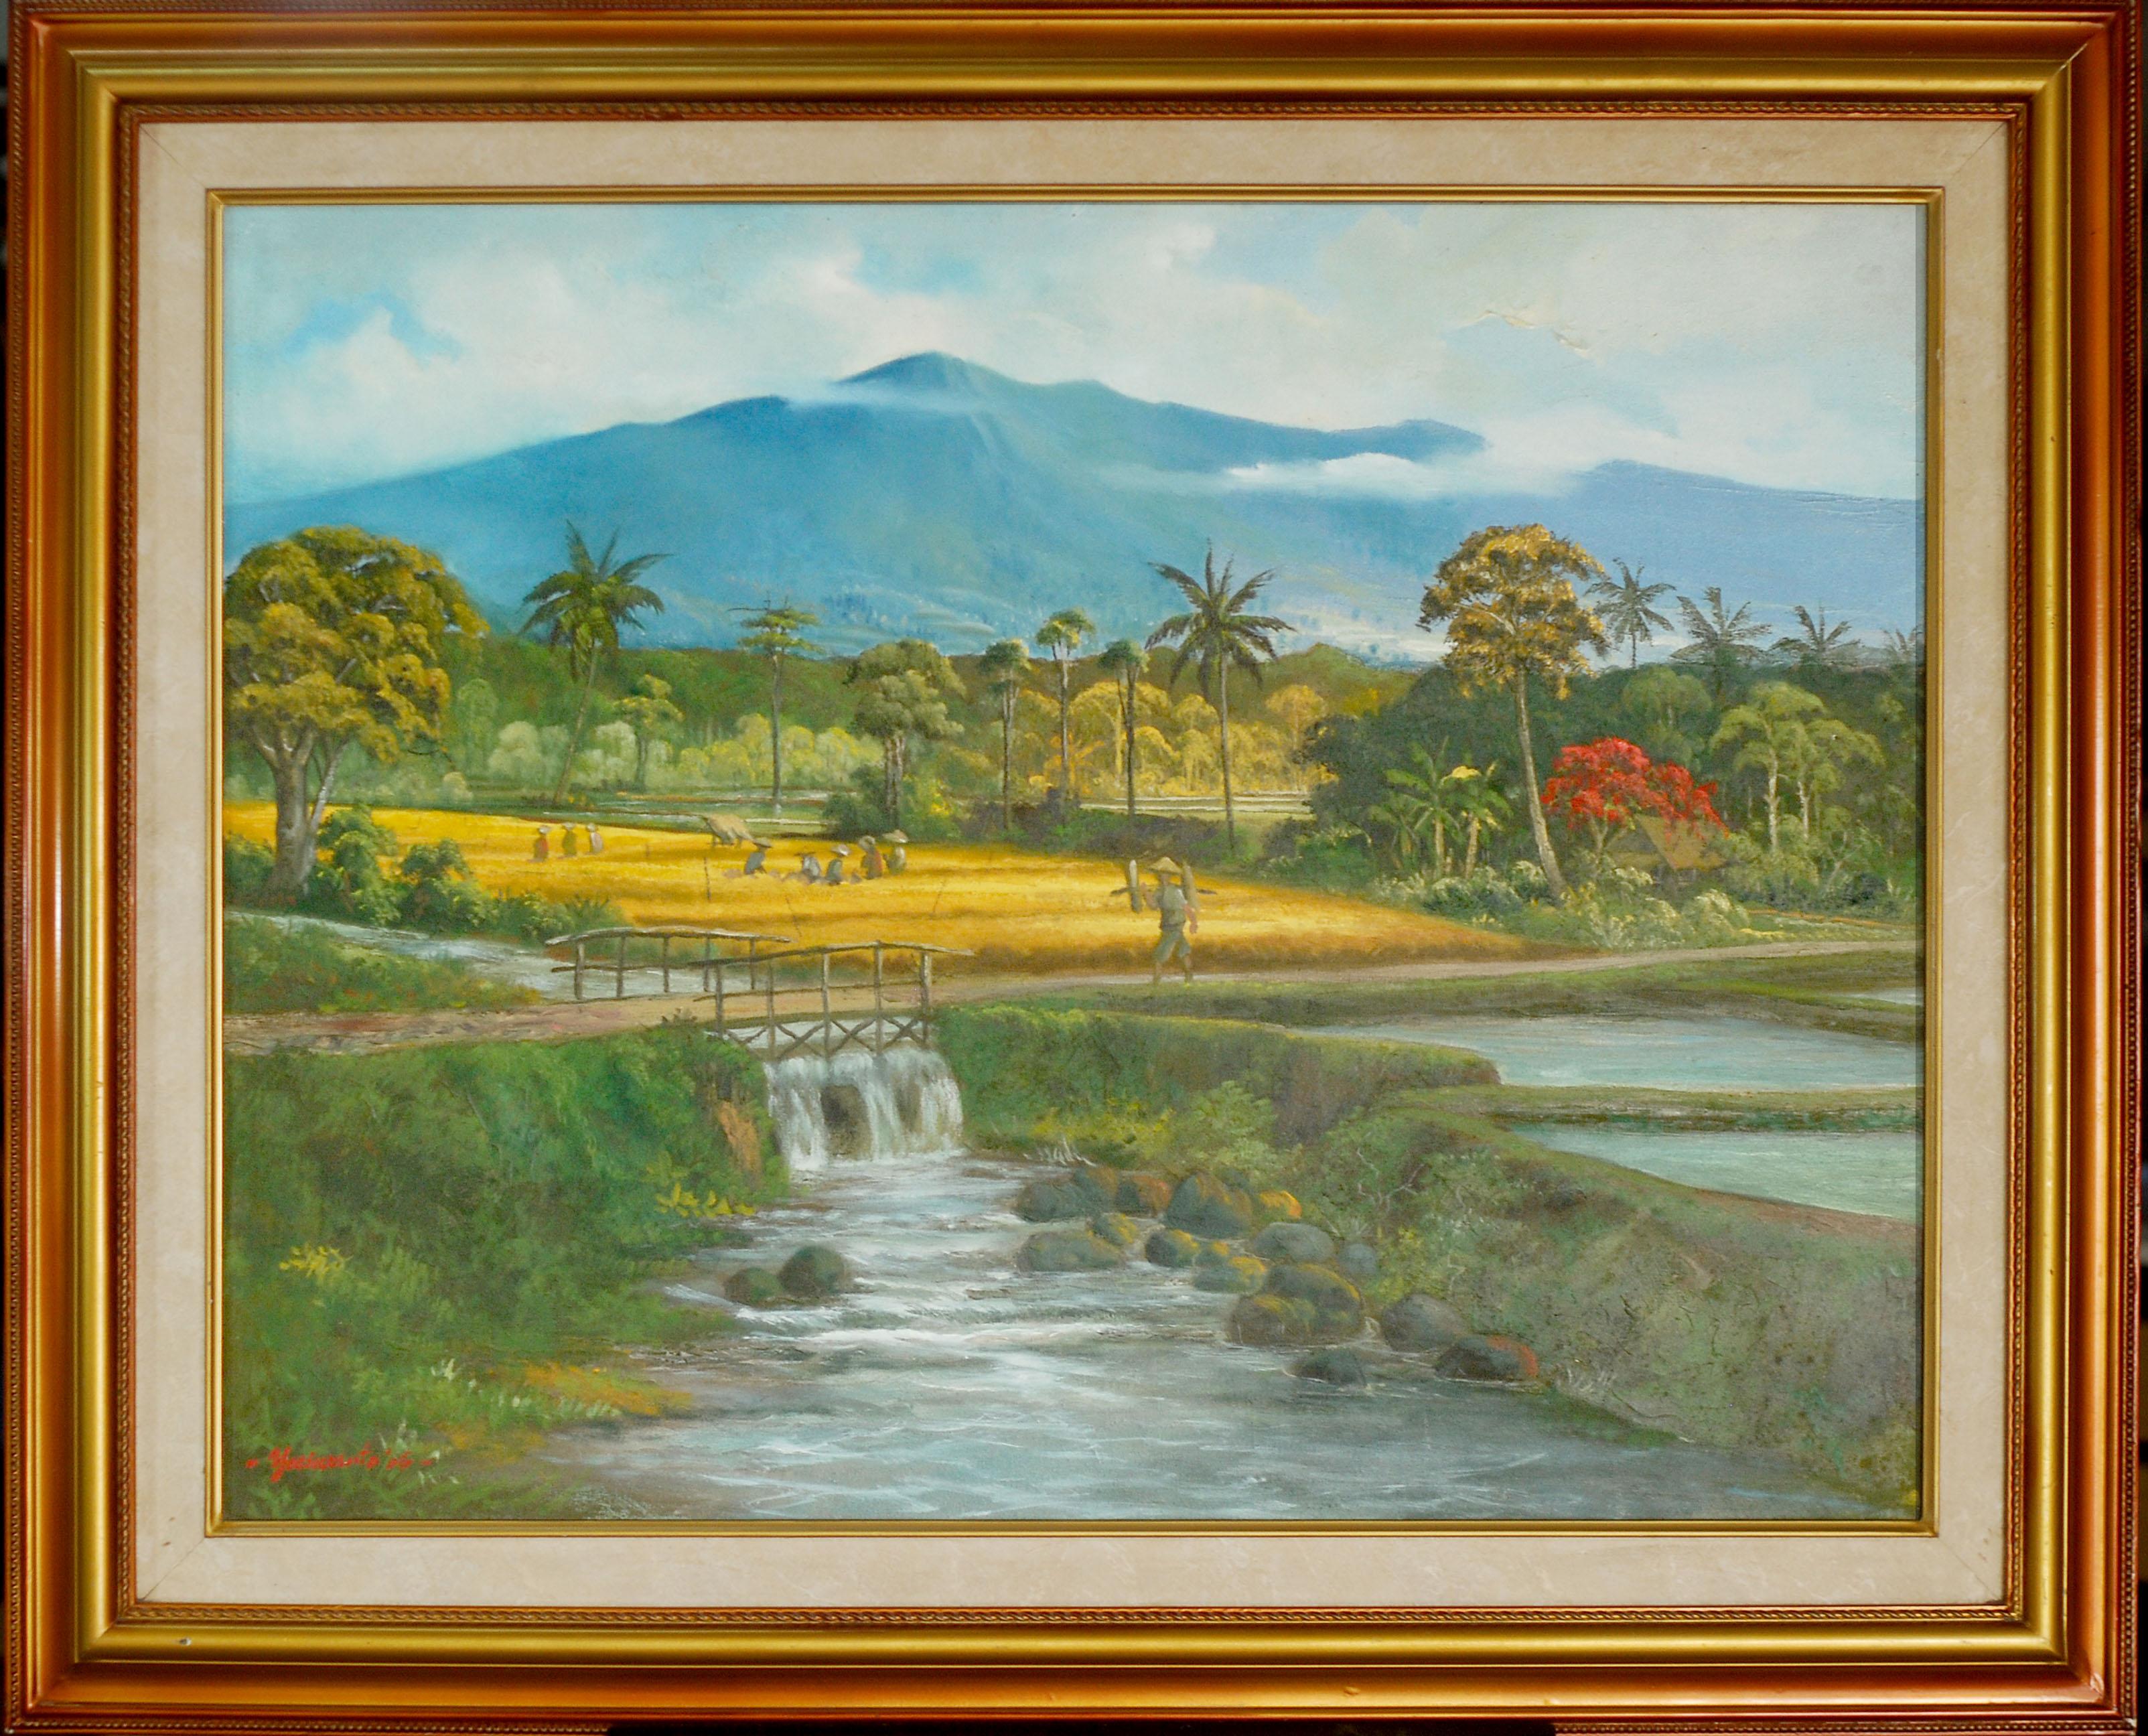 Published May 13, 2012 at 3207 × 2592 in Lukisan Murah, hubungi 0857 ...